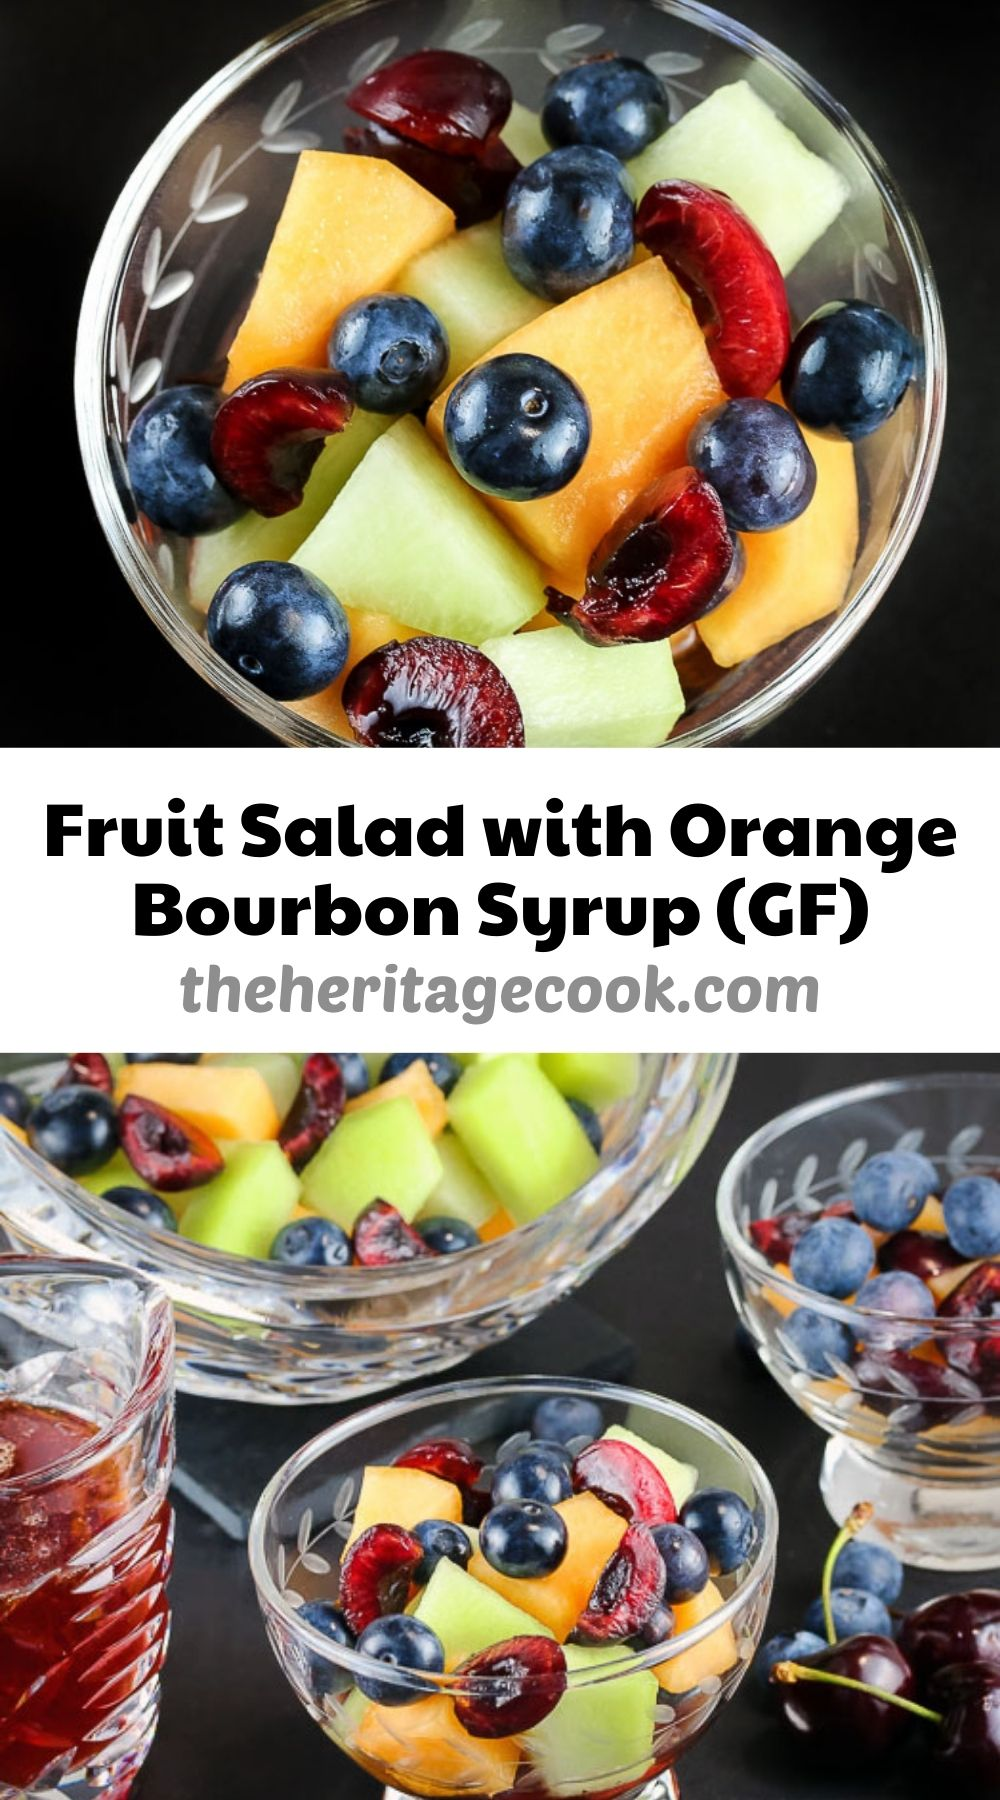 Fresh Fruit Salad with Orange Bourbon Syrup (Gluten-Free) © 2021 Jane Bonacci, The Heritage Cook.